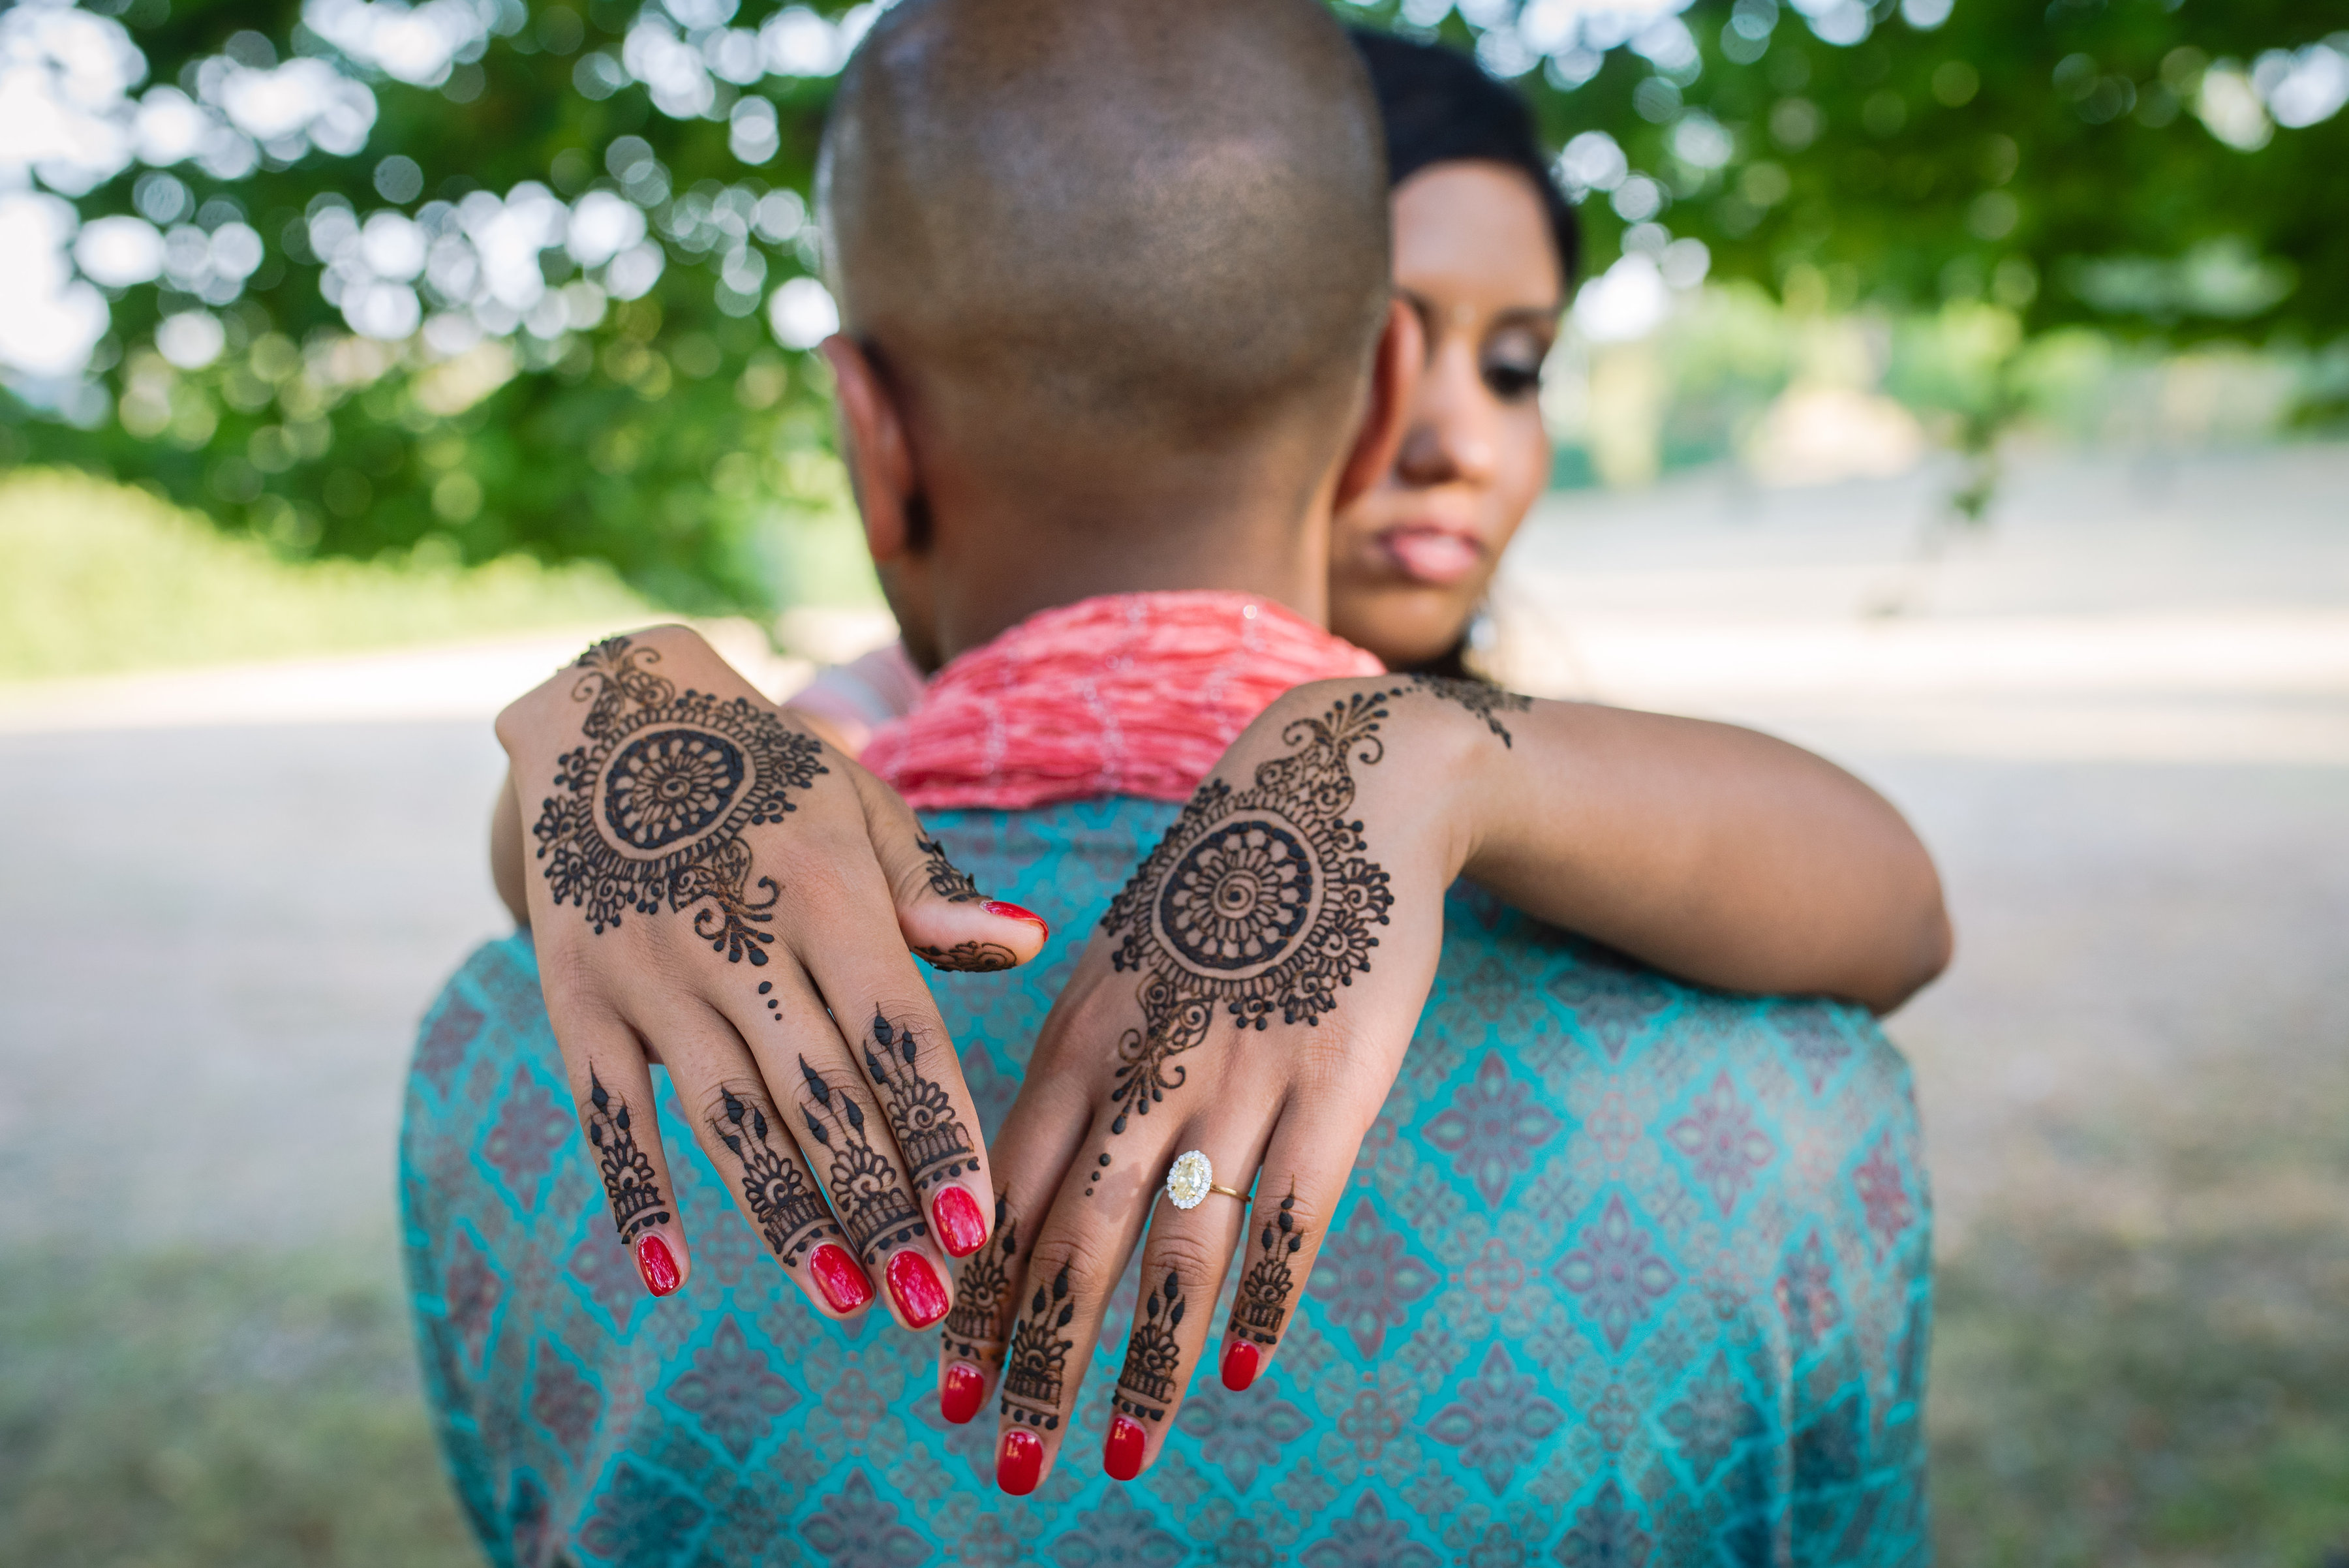 Arun&Diyaweddingday1-ChateauDeMalliac-JonnyBarrattPhotography-293